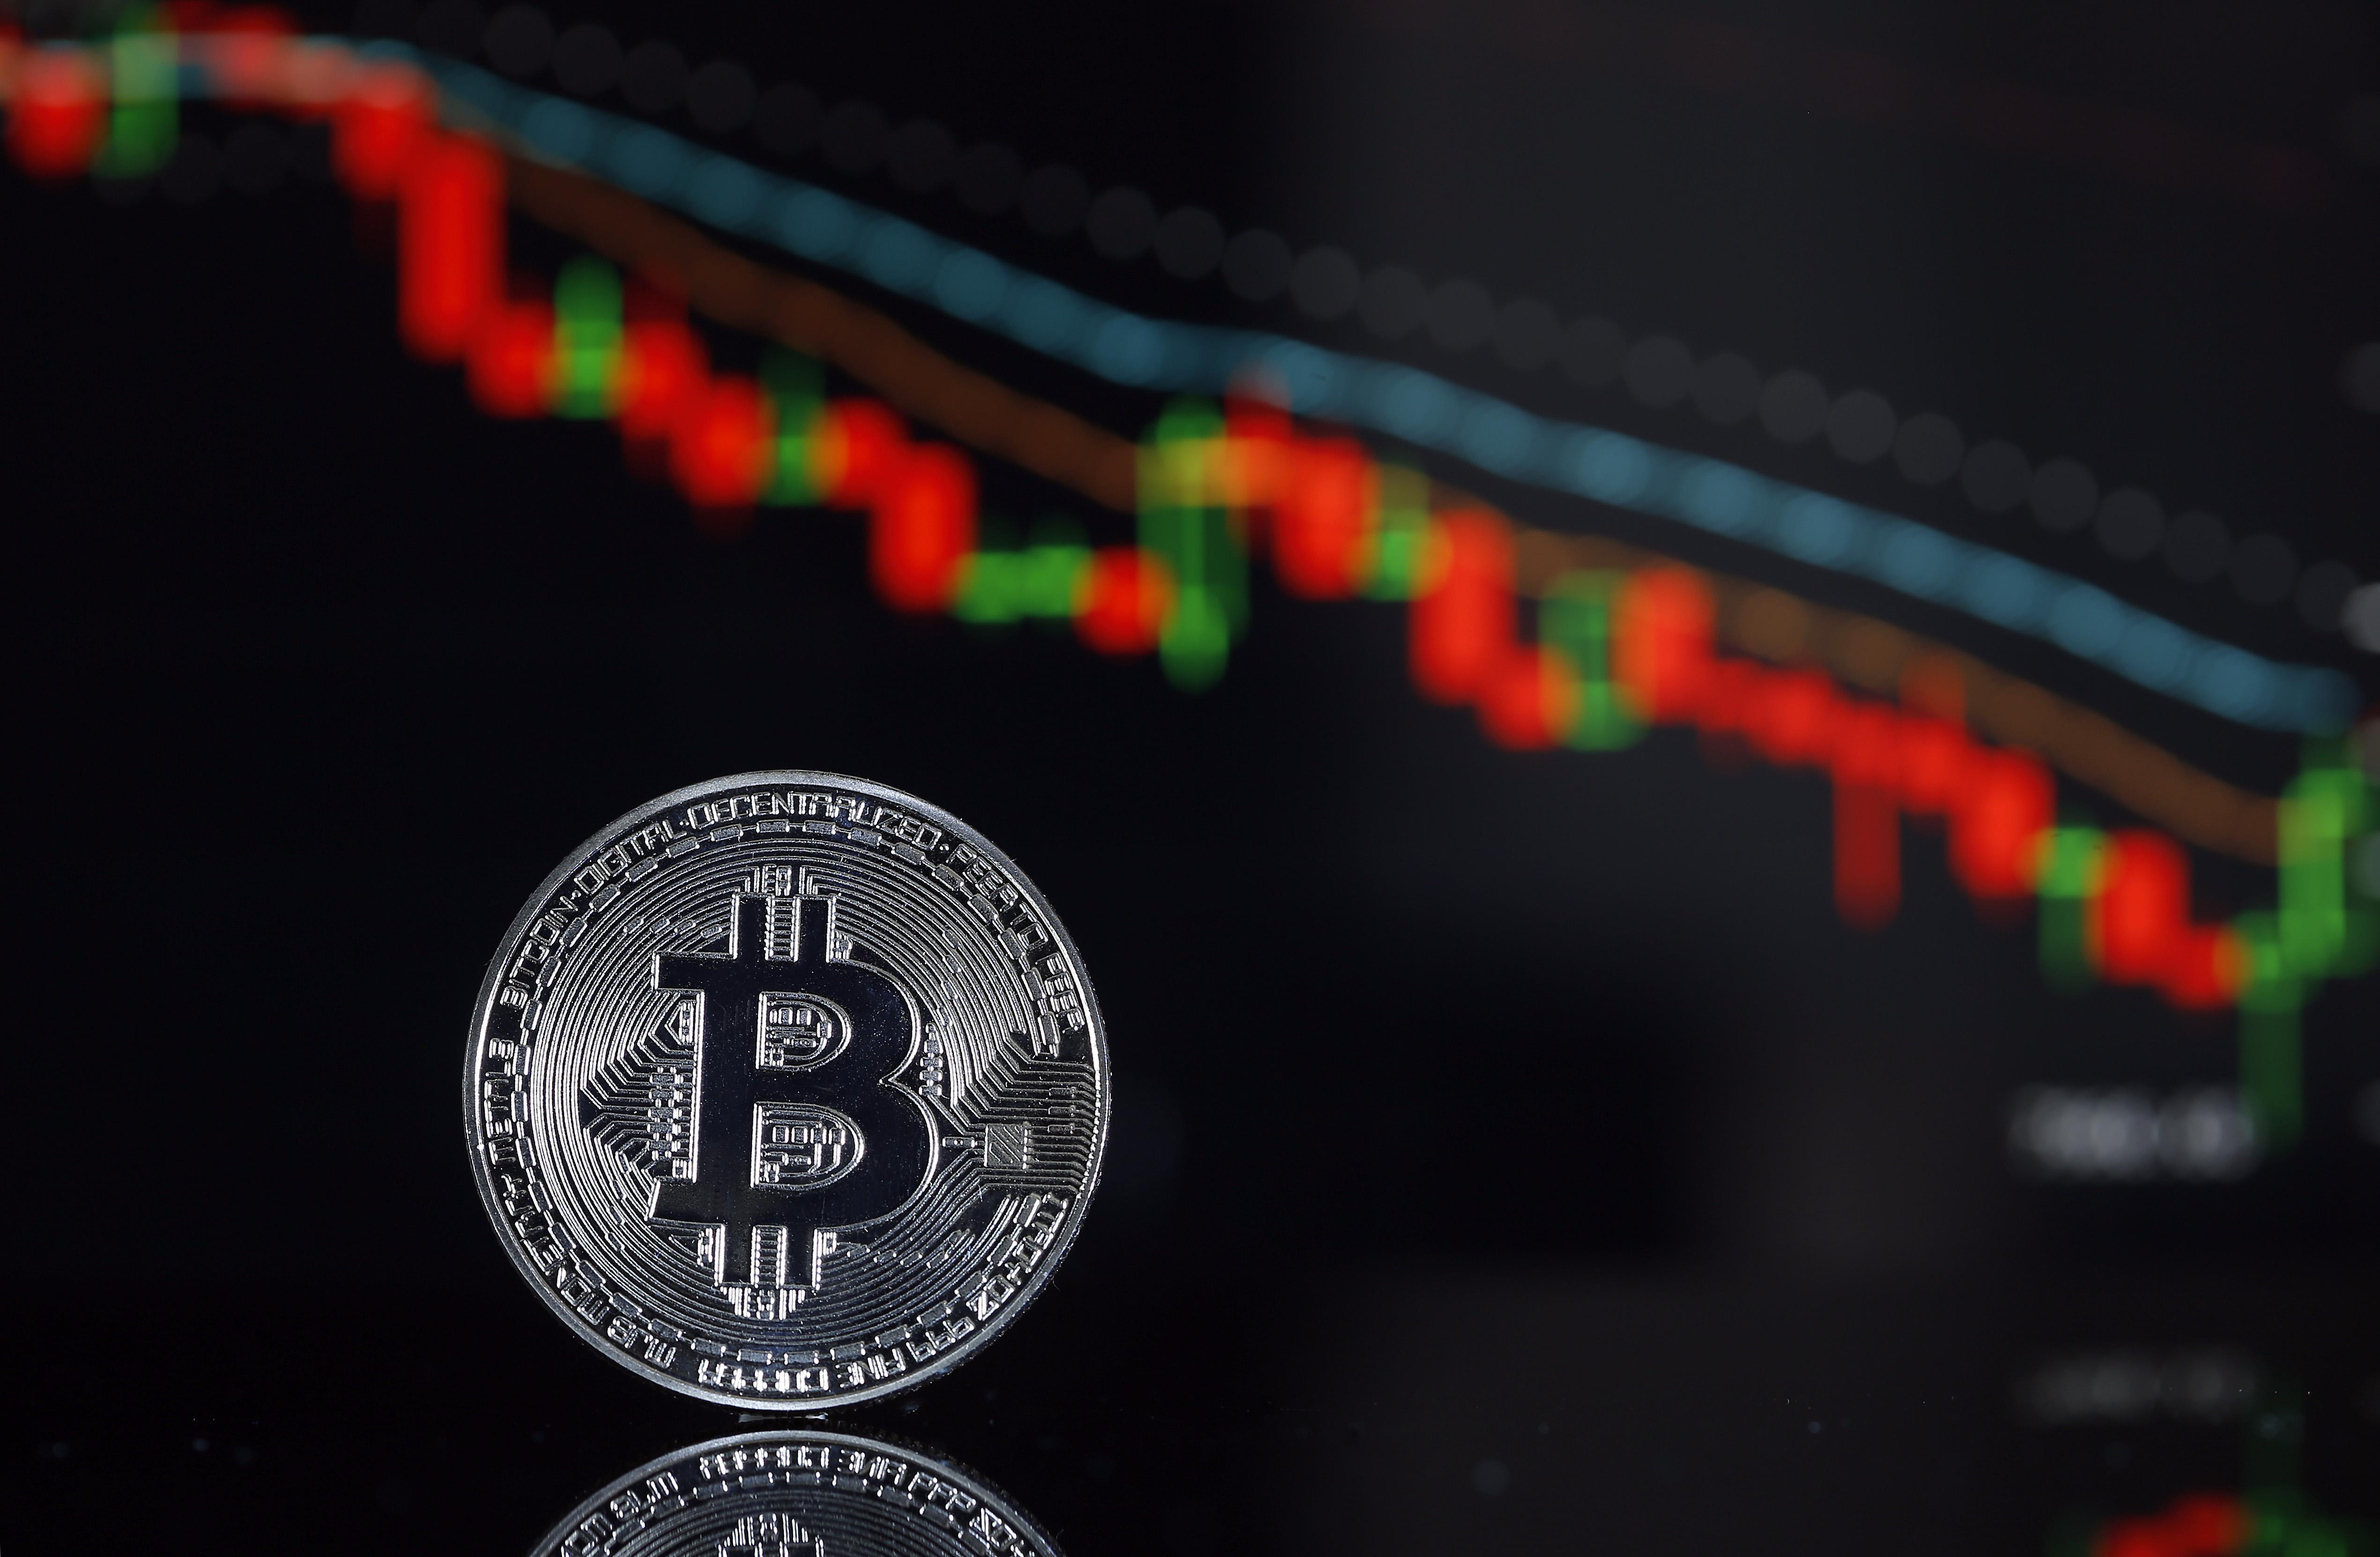 Bitcoin Cryptocurrency price crash ethereum 2018 tether